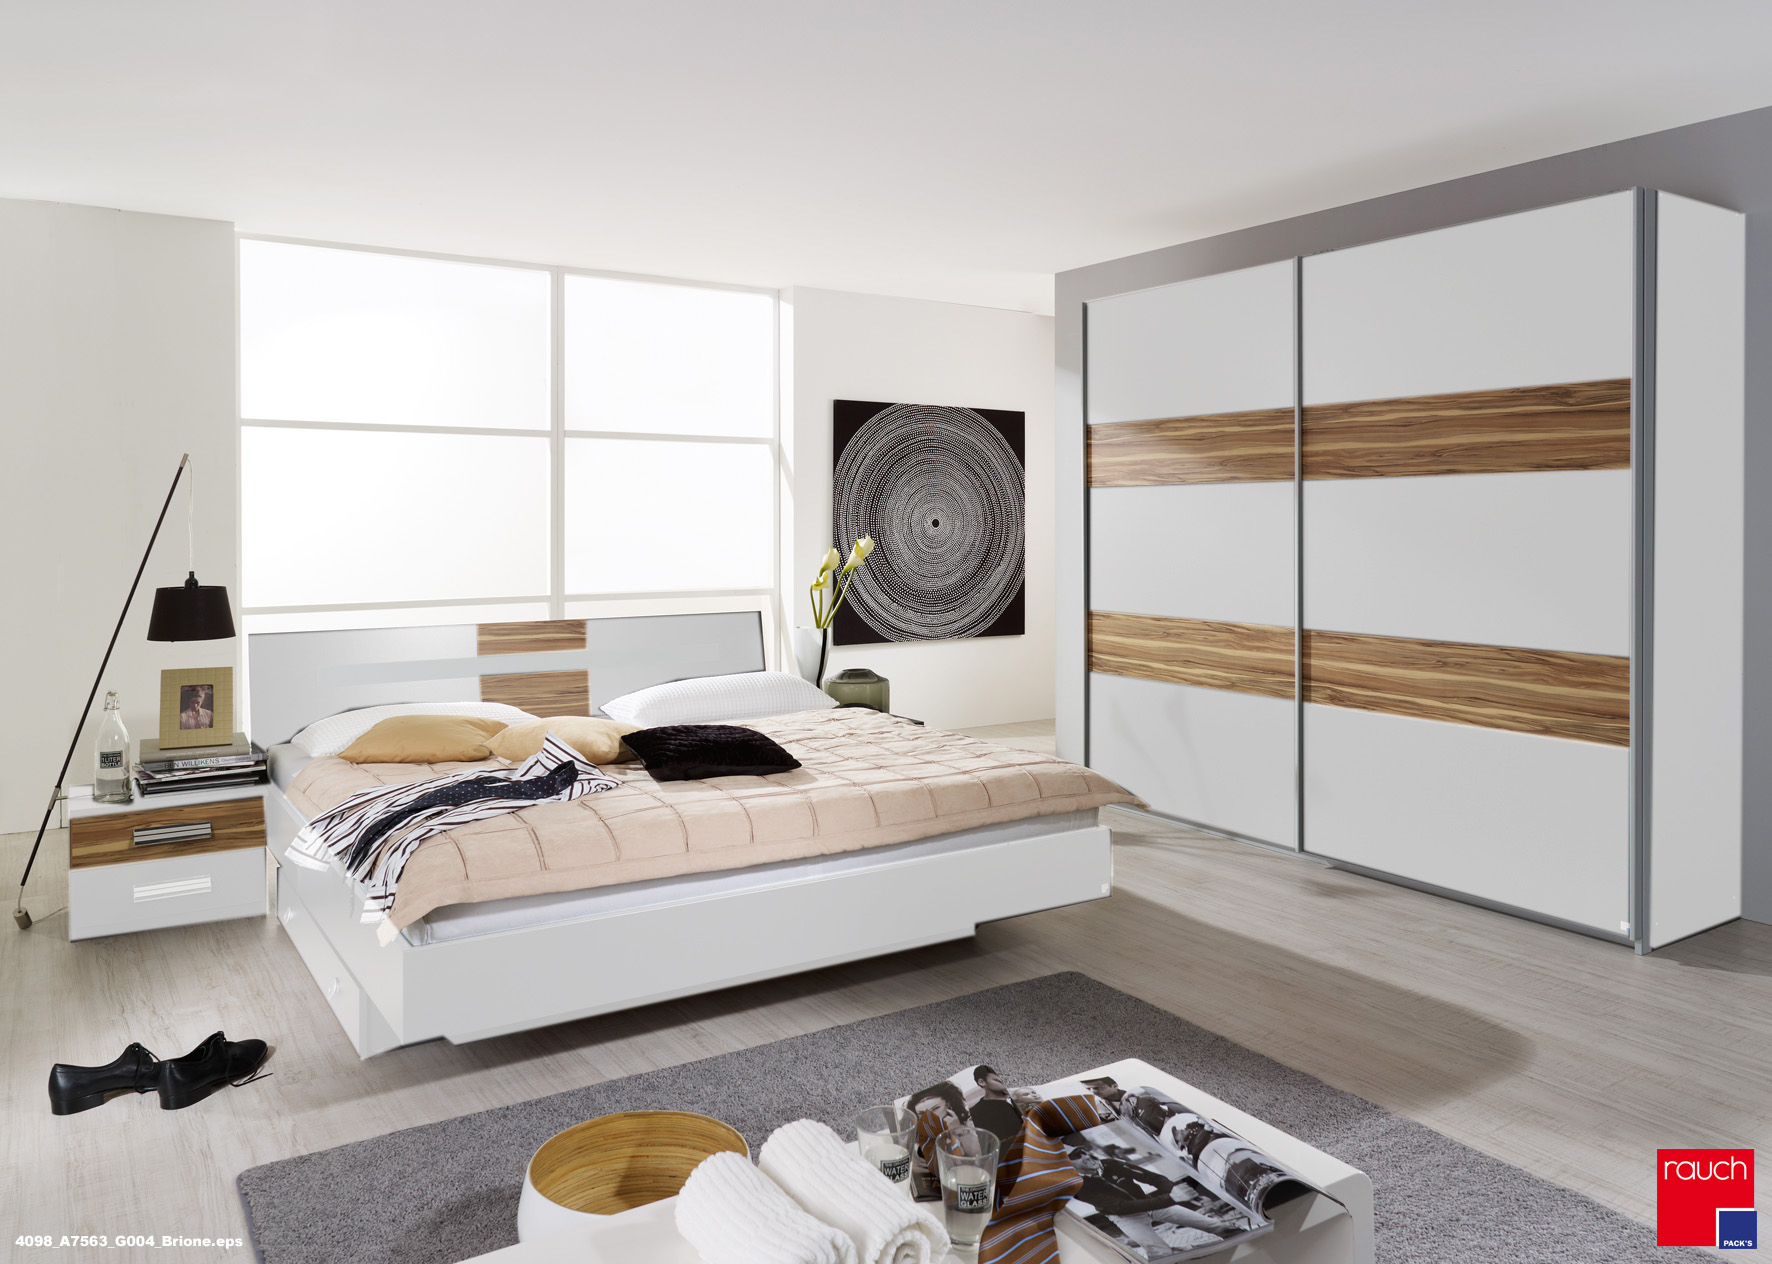 schlafzimmer komplett schlafzimmer b2b trade. Black Bedroom Furniture Sets. Home Design Ideas